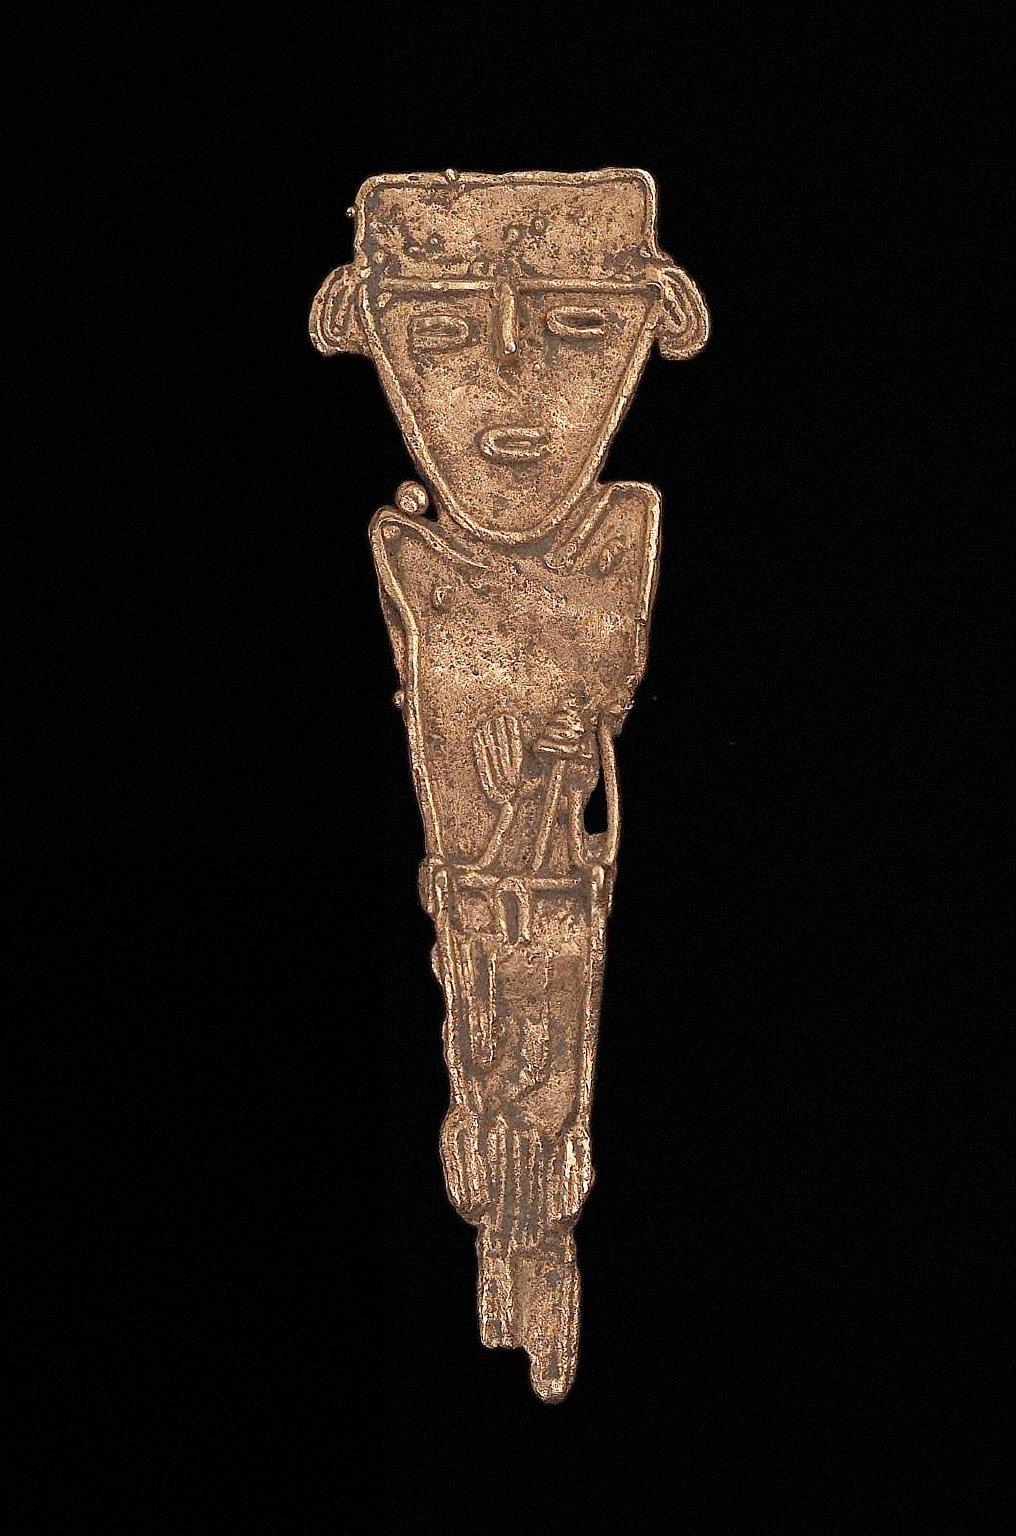 Male effigy figure holding a staff?